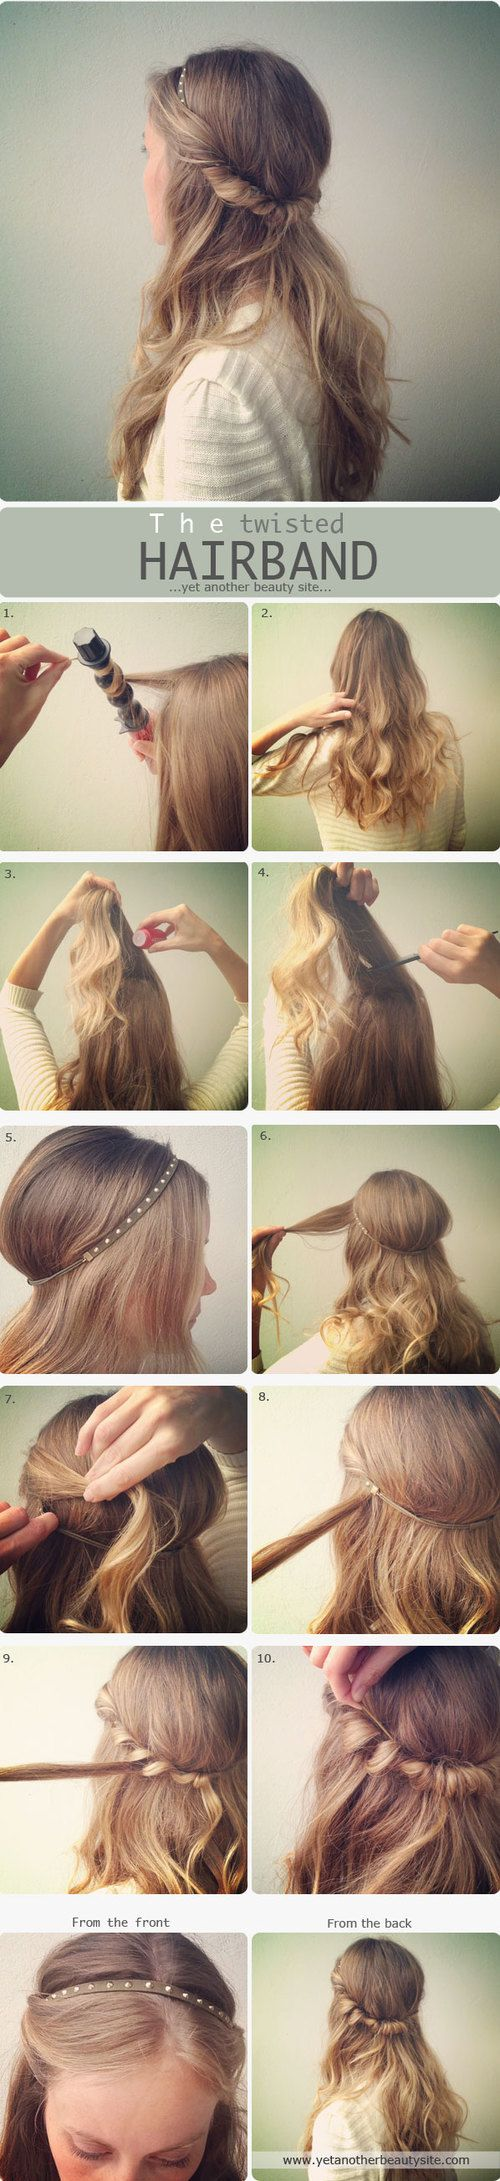 Twisted hairband